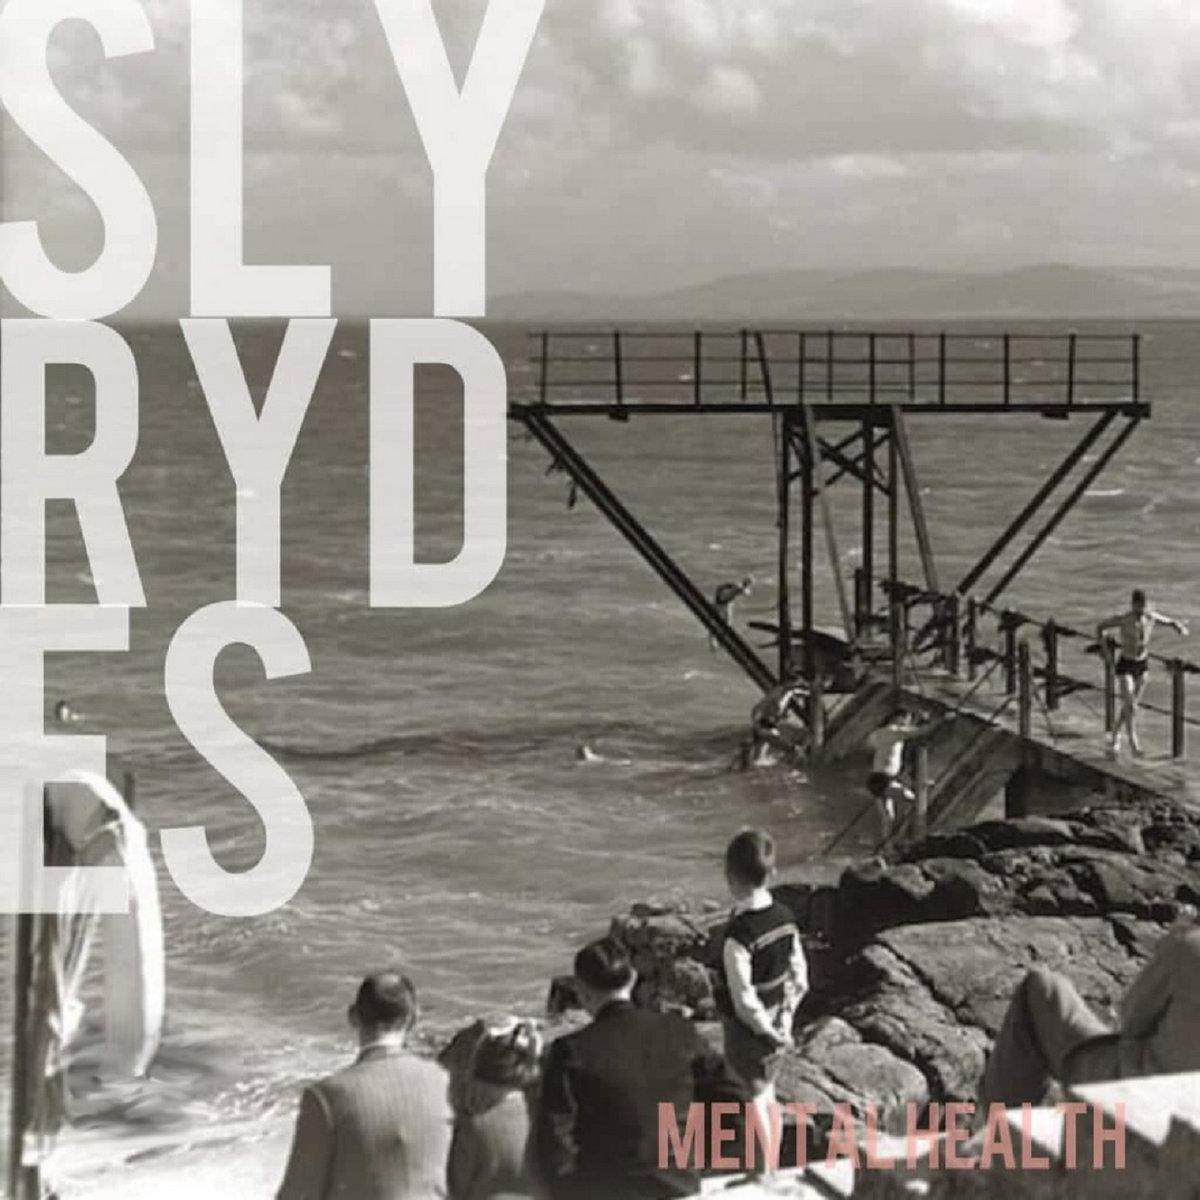 Mental Health by Slyrydes